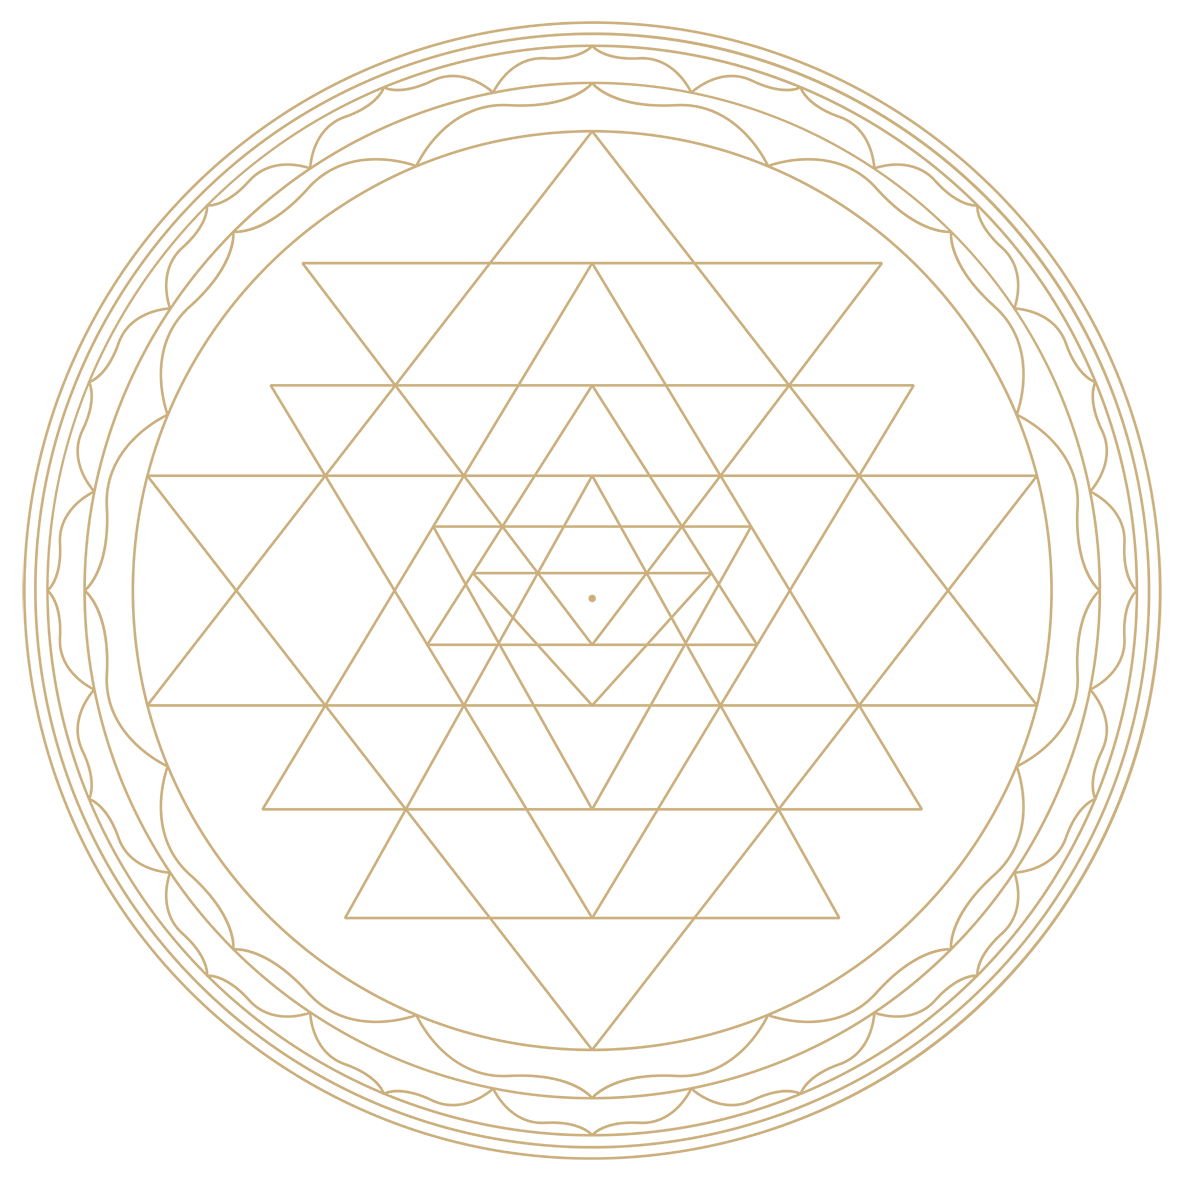 Selbstentdeckung Logo